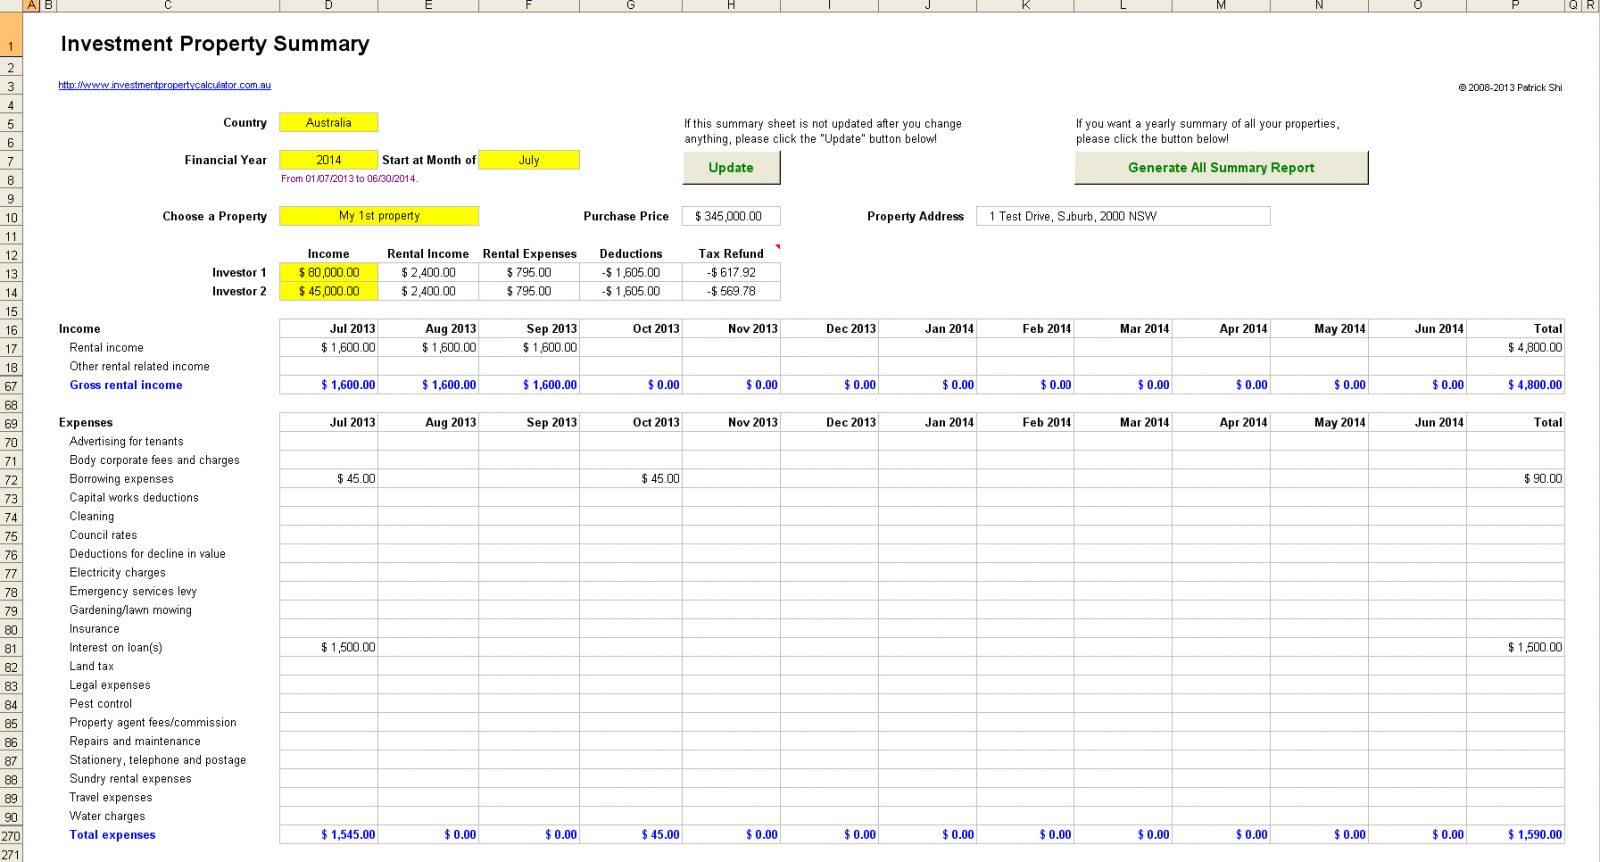 Multifamily Investment Spreadsheet Inside Real Estate Investment Spreadsheet Excelal Analysis Multi Family